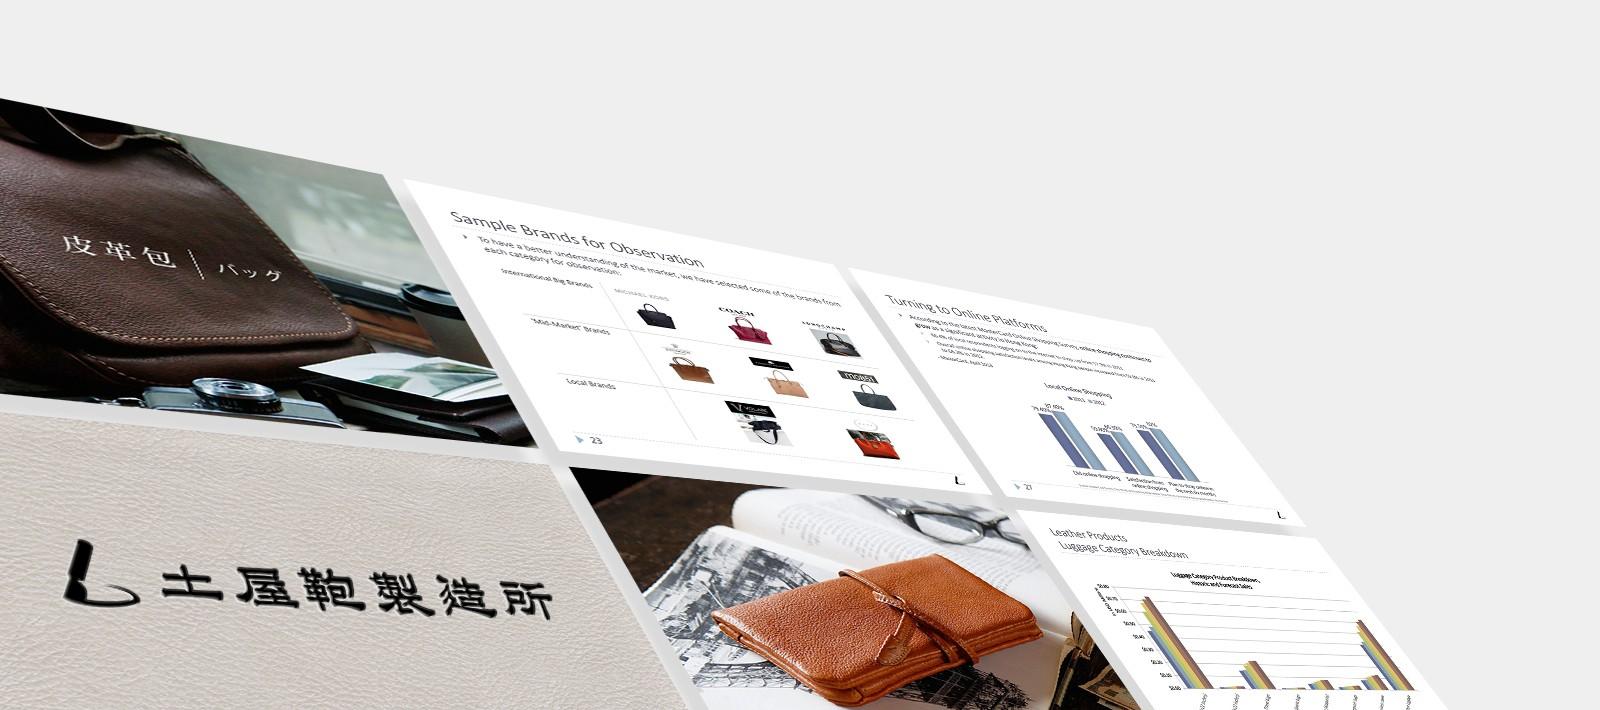 Tsuchiya kaban fashion accessories brand book